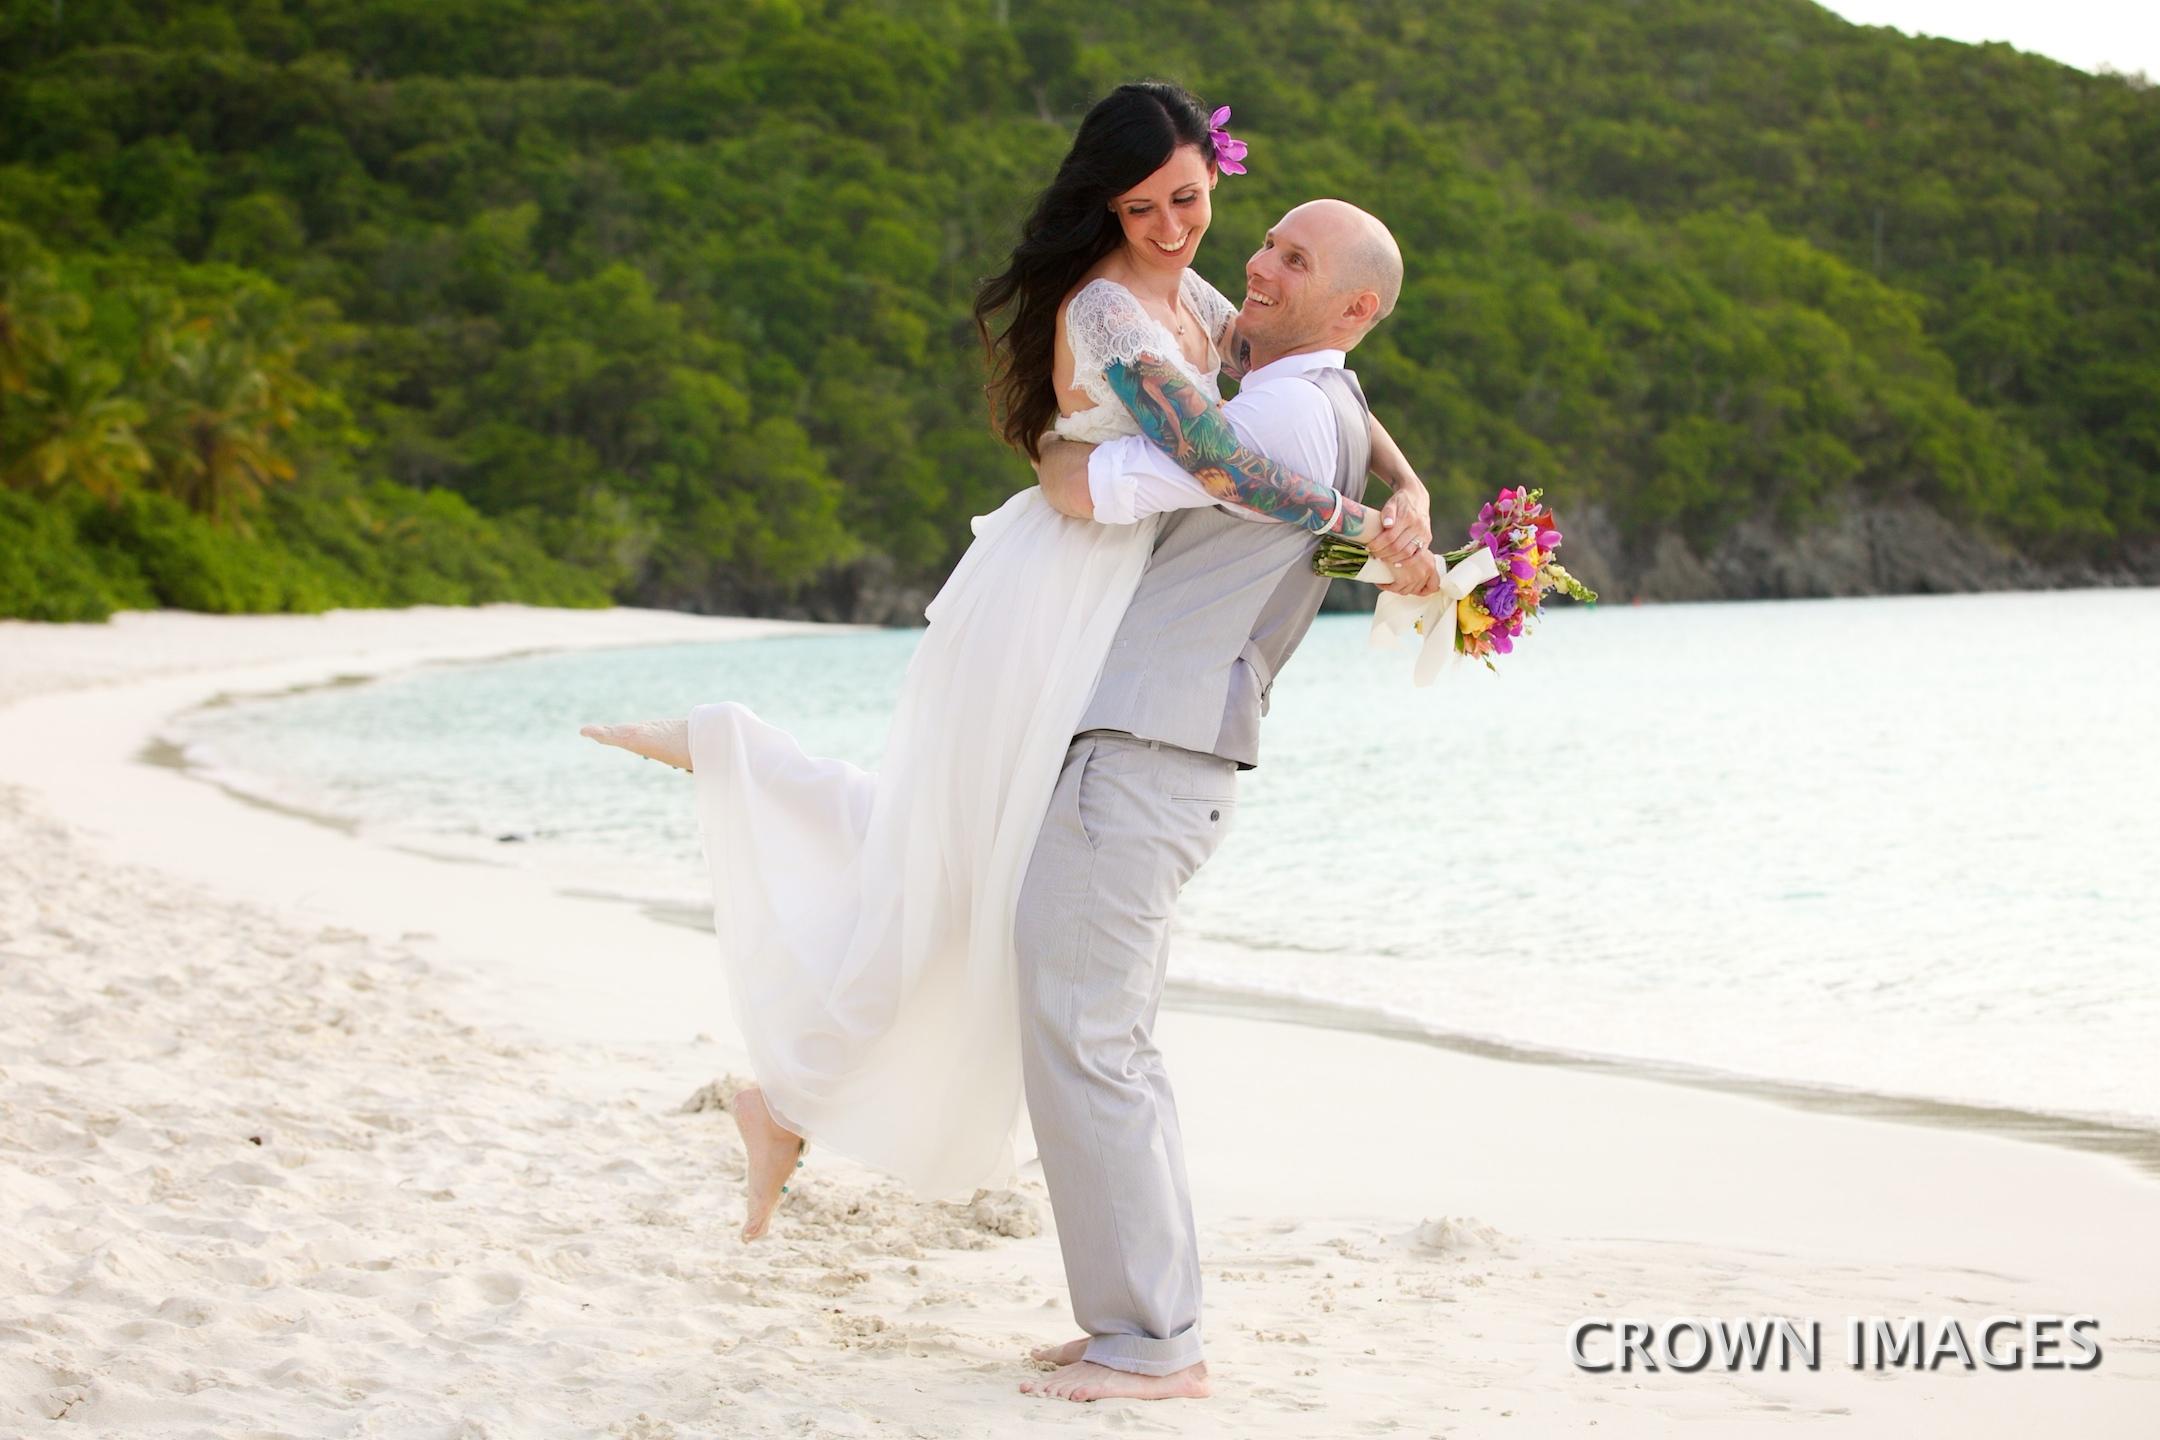 wedding photographer crown images st john usvi